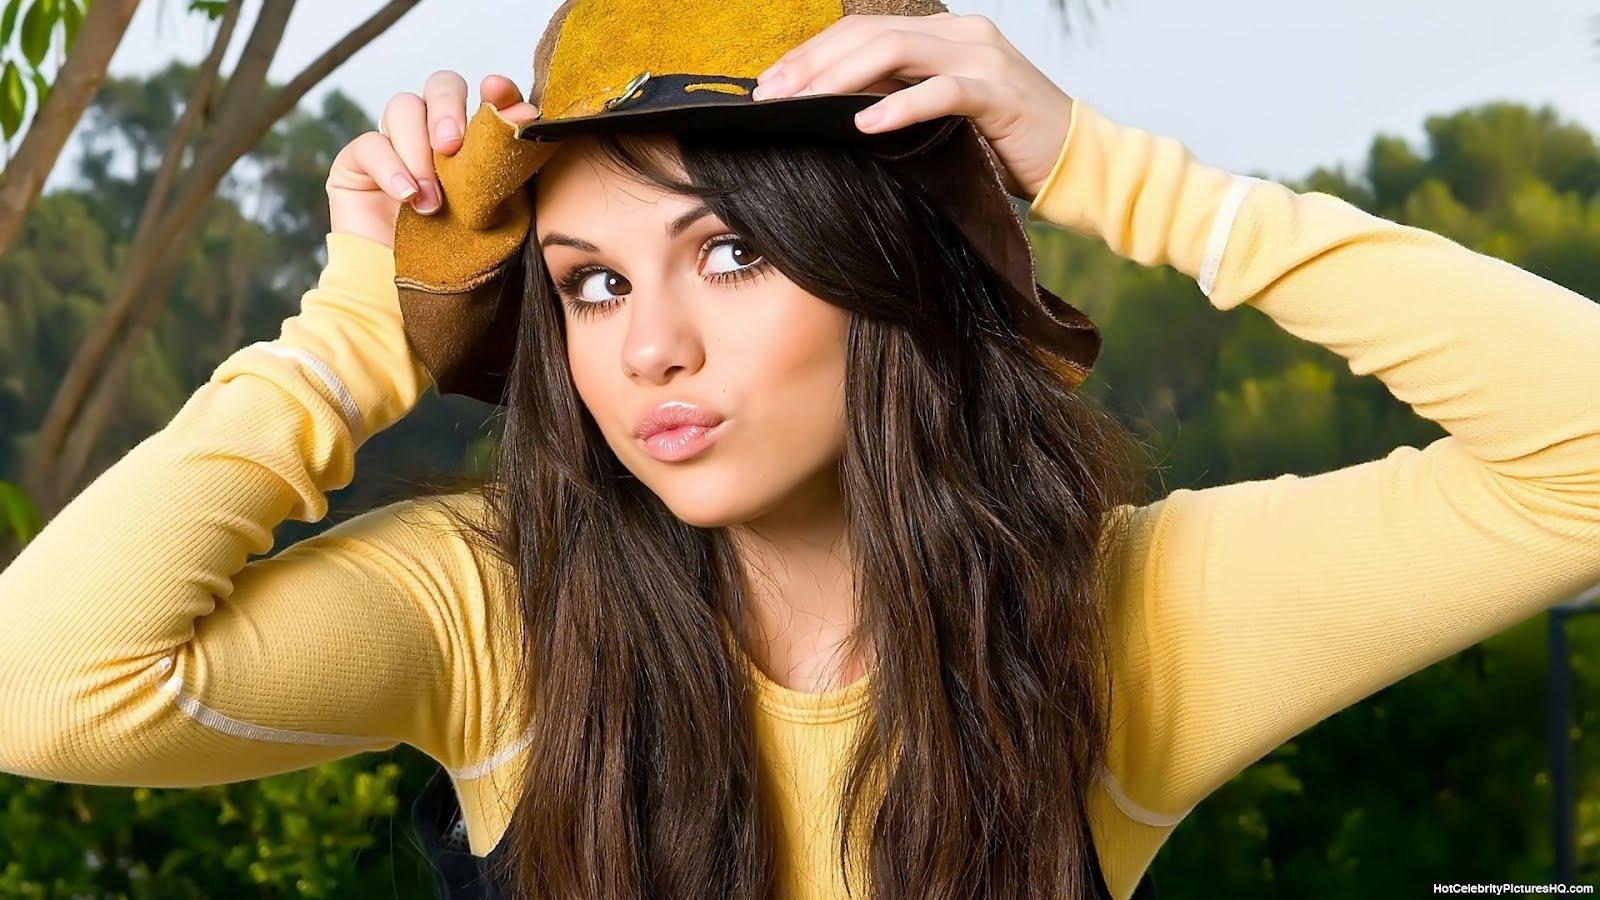 Free Selena Gomez Hd Wallpapers: Selena Gomez HD Wallpapers